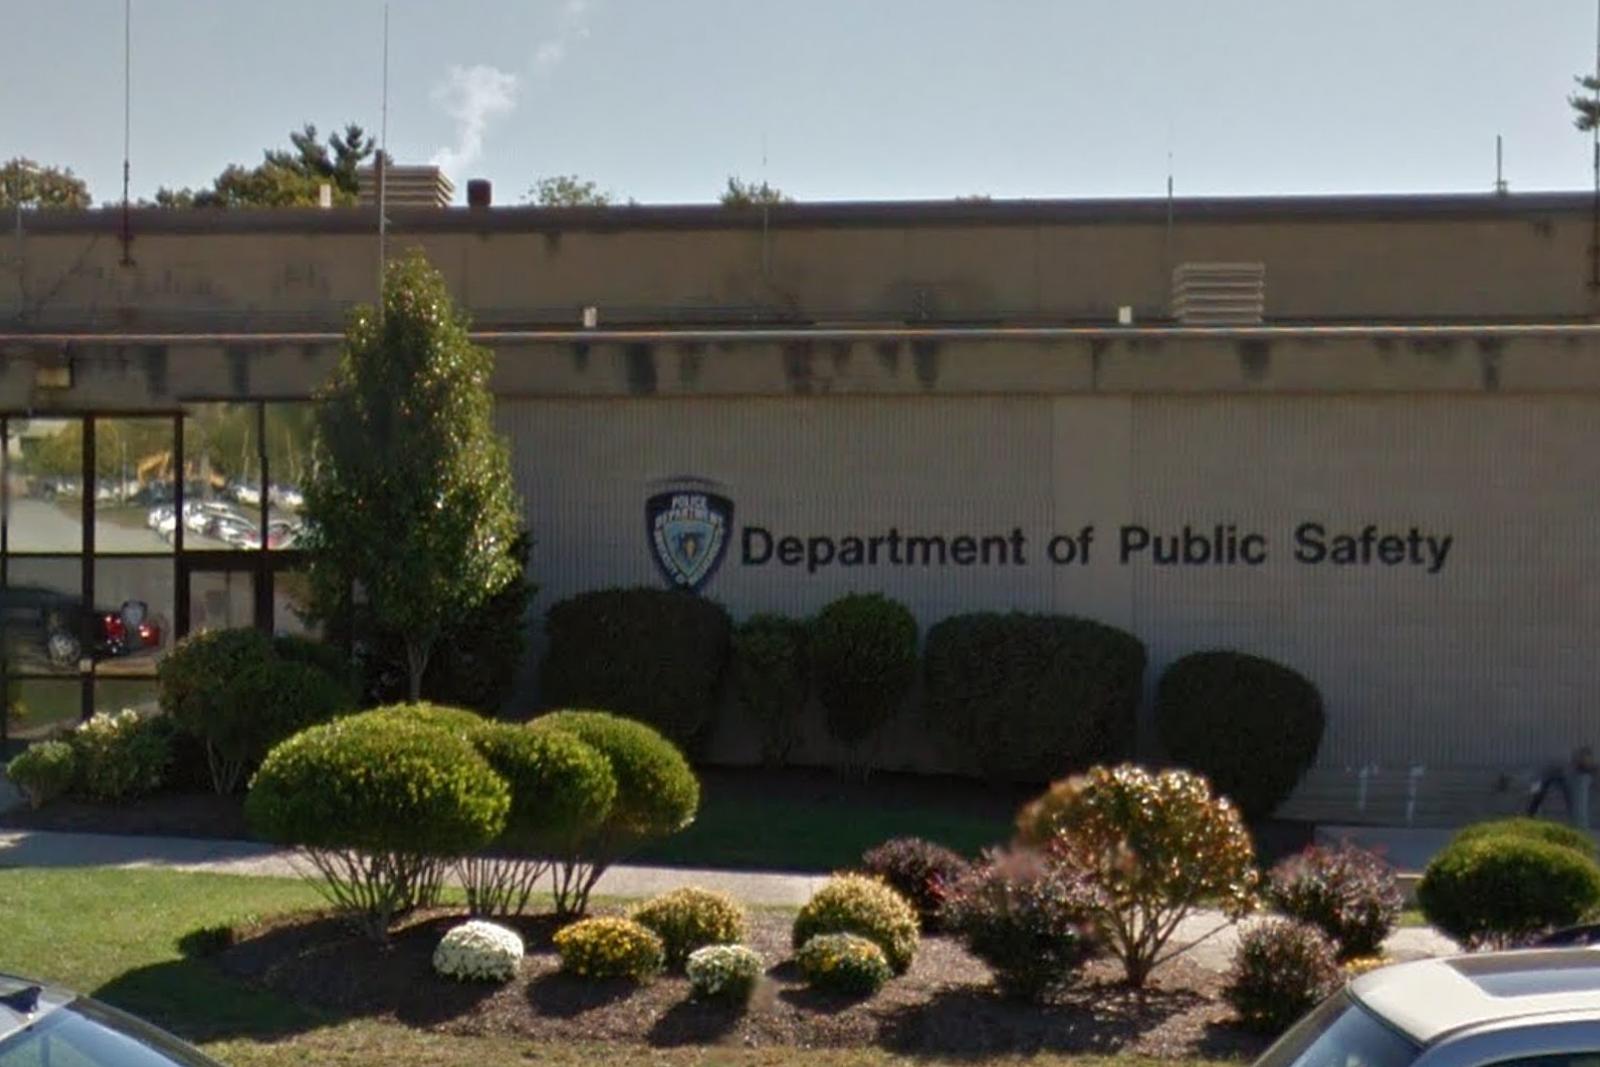 UMass Dartmouth Police Earn Re-Accreditation